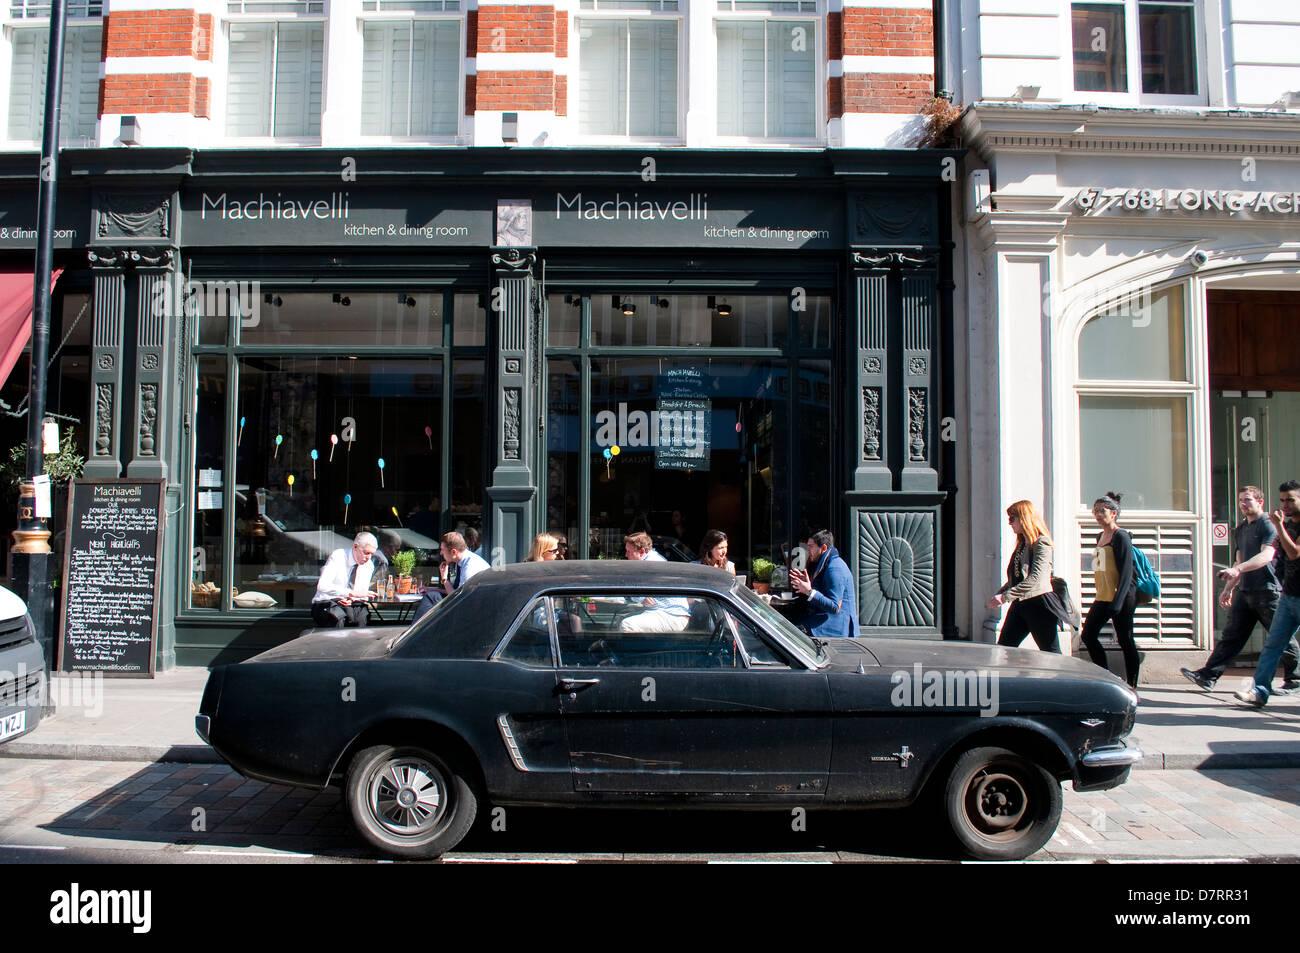 Machiavelli Restaurant In Long Acre Street Behind Old Mustang Covent Garden London UK